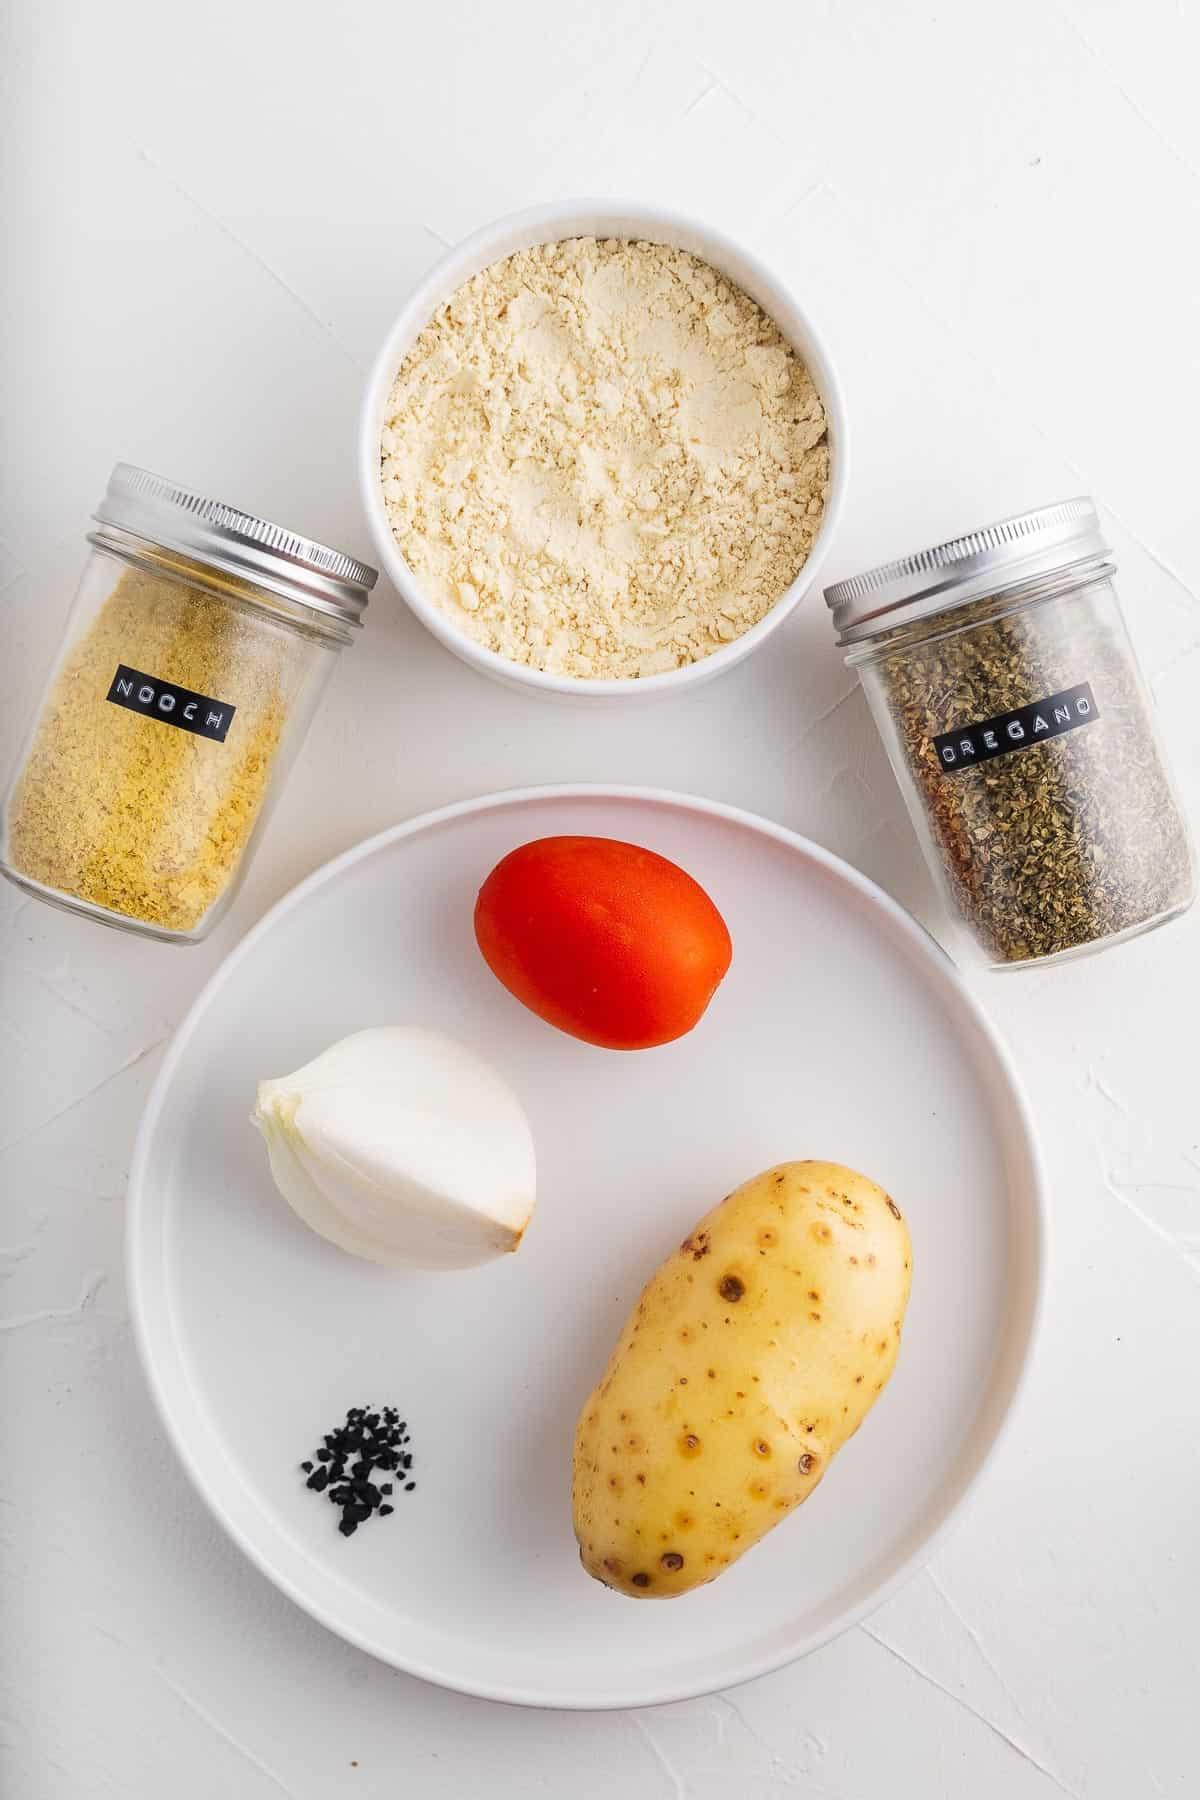 Nooch, Potato, Tomato, Black Salt, Onion, Chickpea Flour, and Oregano